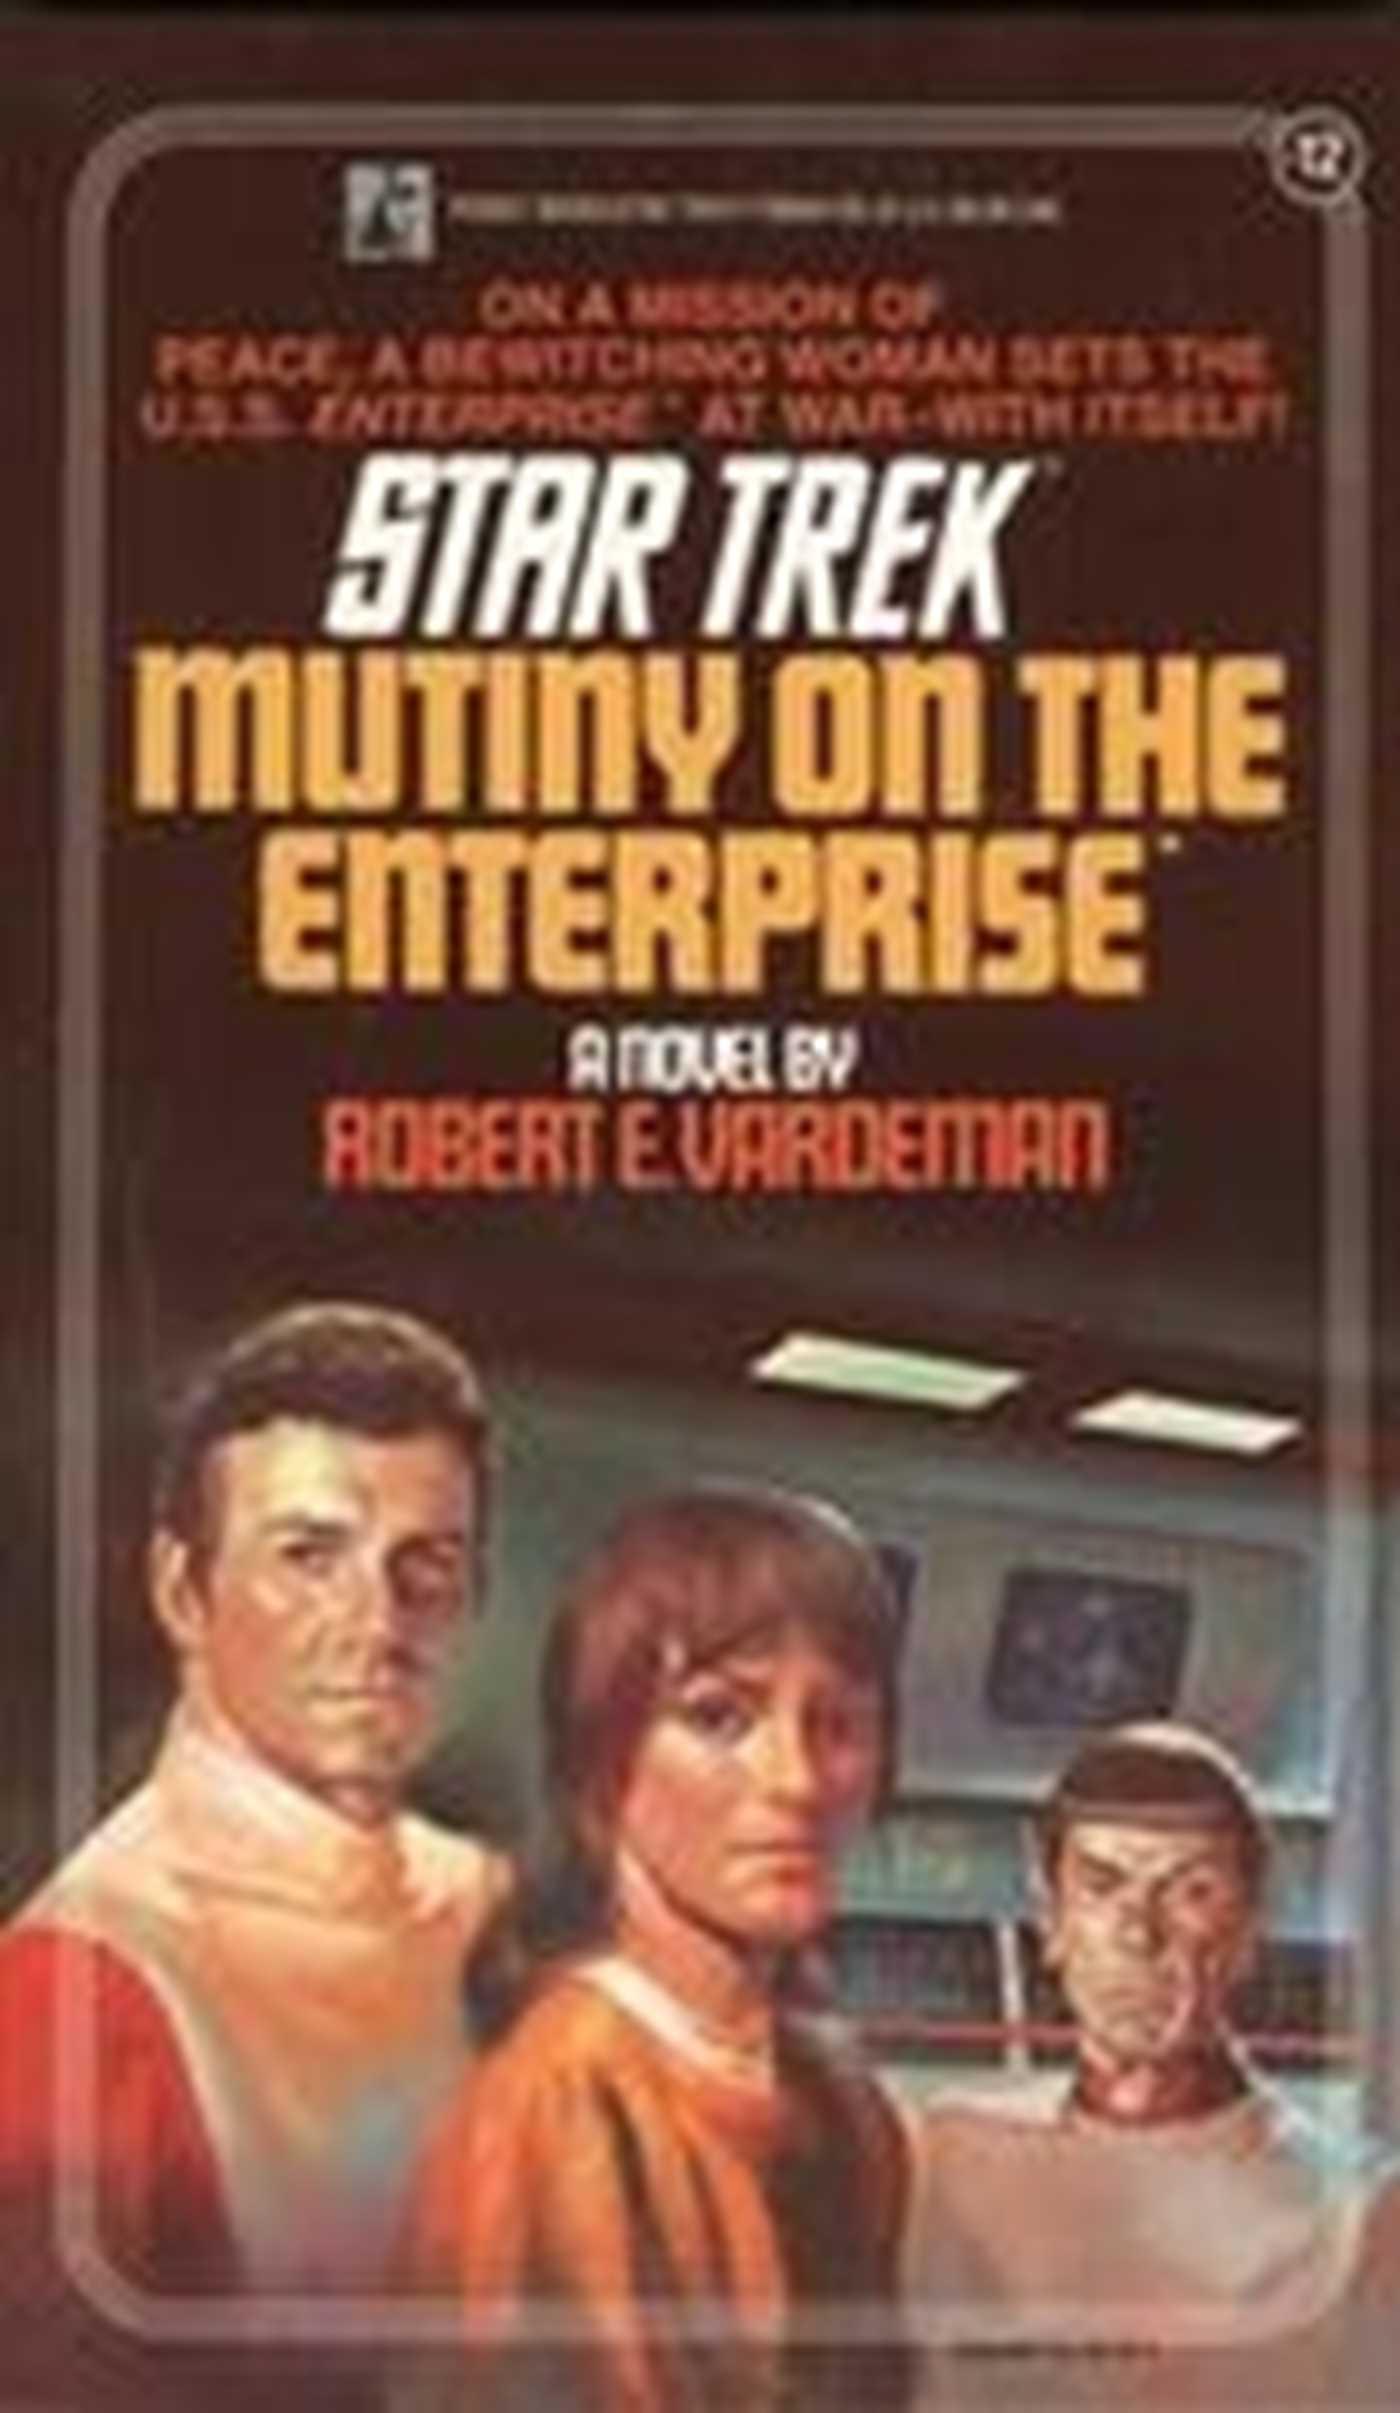 Mutiny on the enterprise 9780743419635 hr